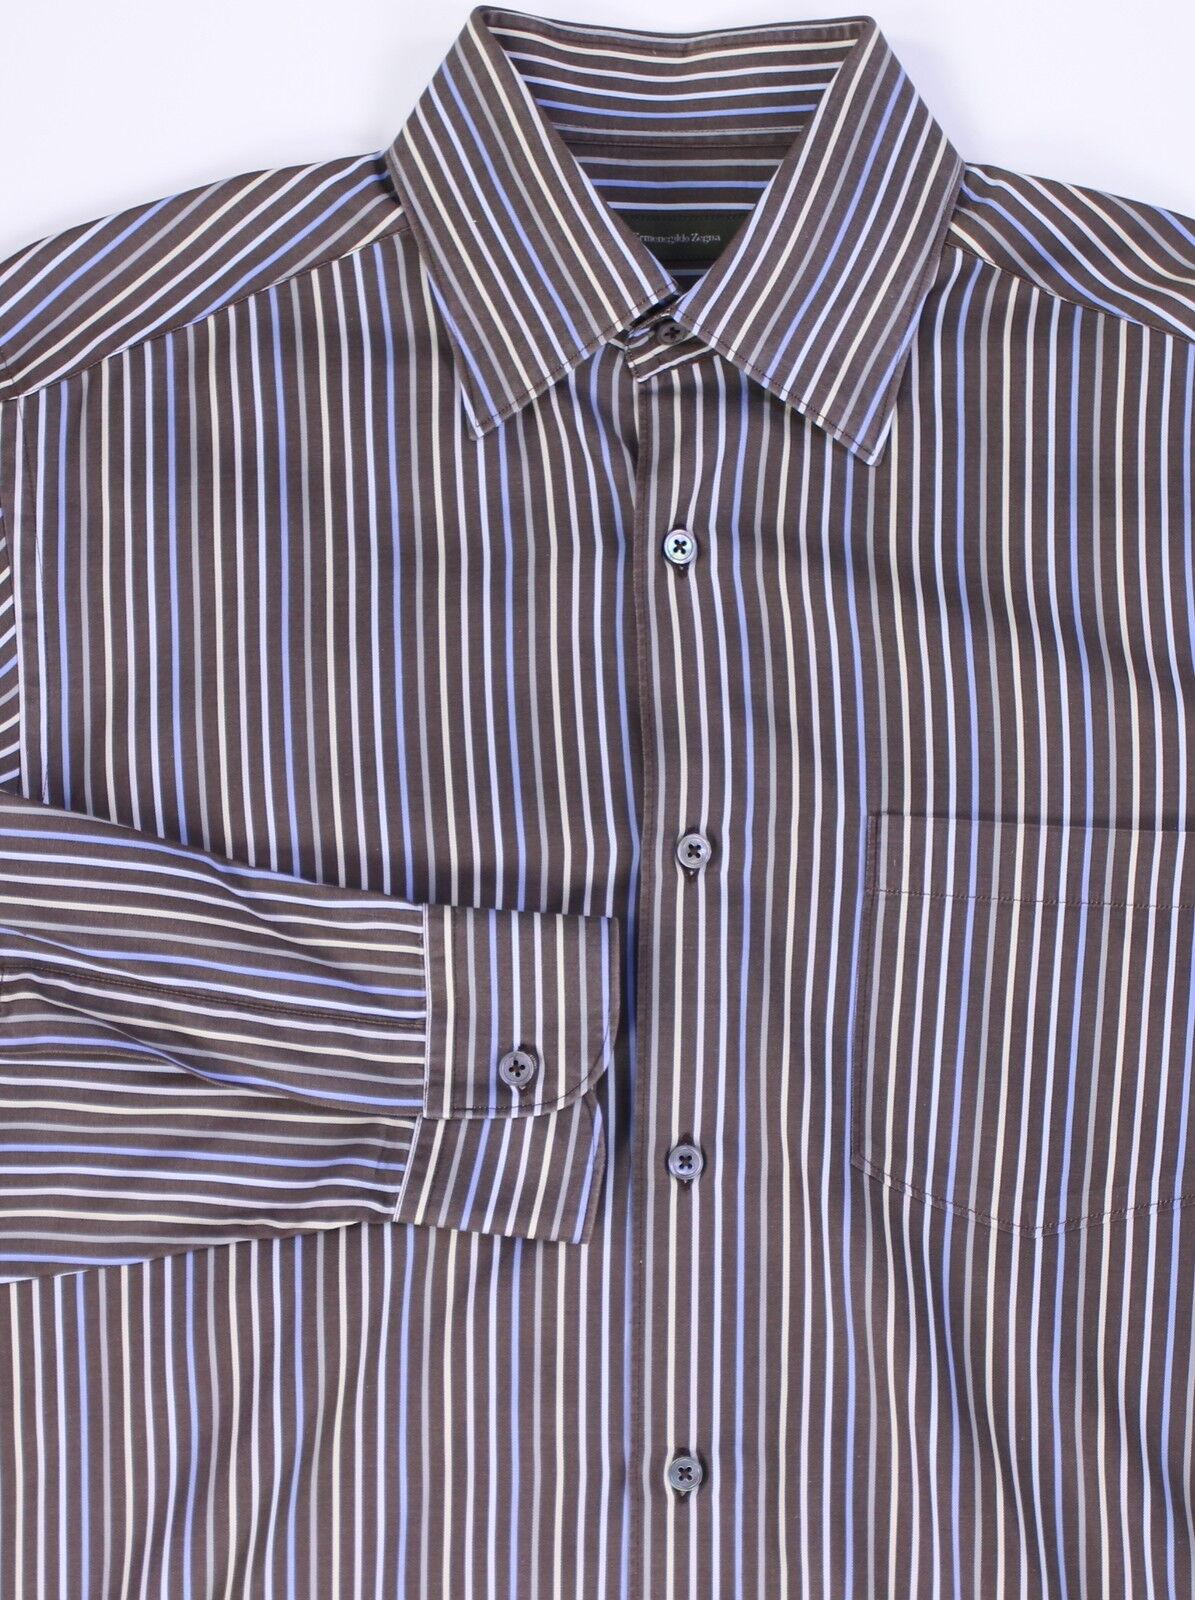 ERMENEGILDO ZEGNA  Brown w  bluee Stripes Cotton Dress Shirt Medium